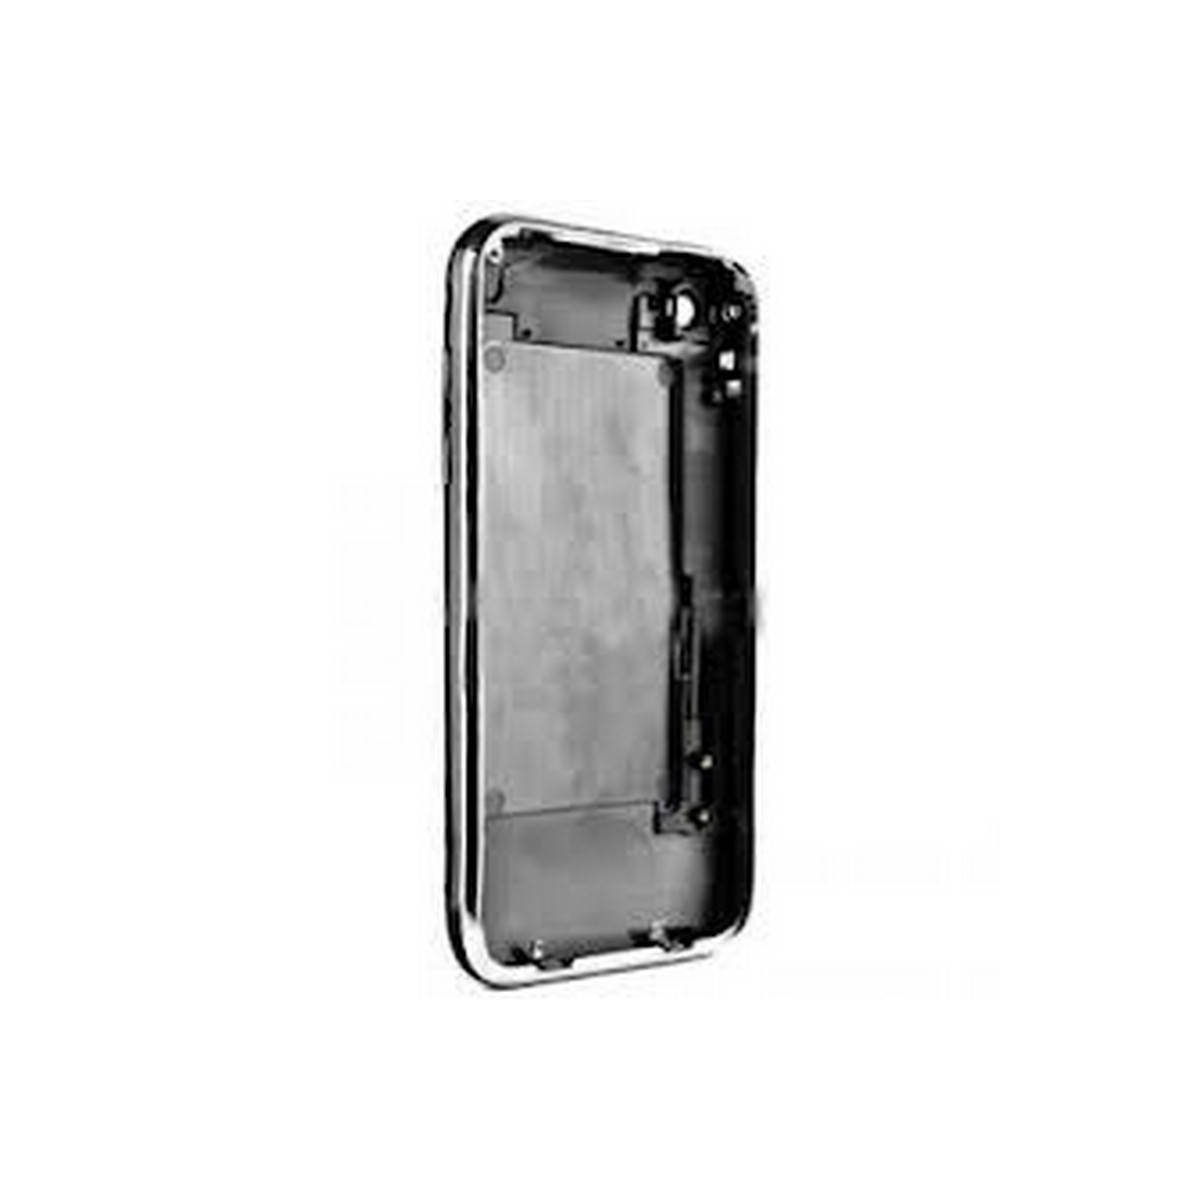 Tapa con marco iphone 3G Negra 16GB